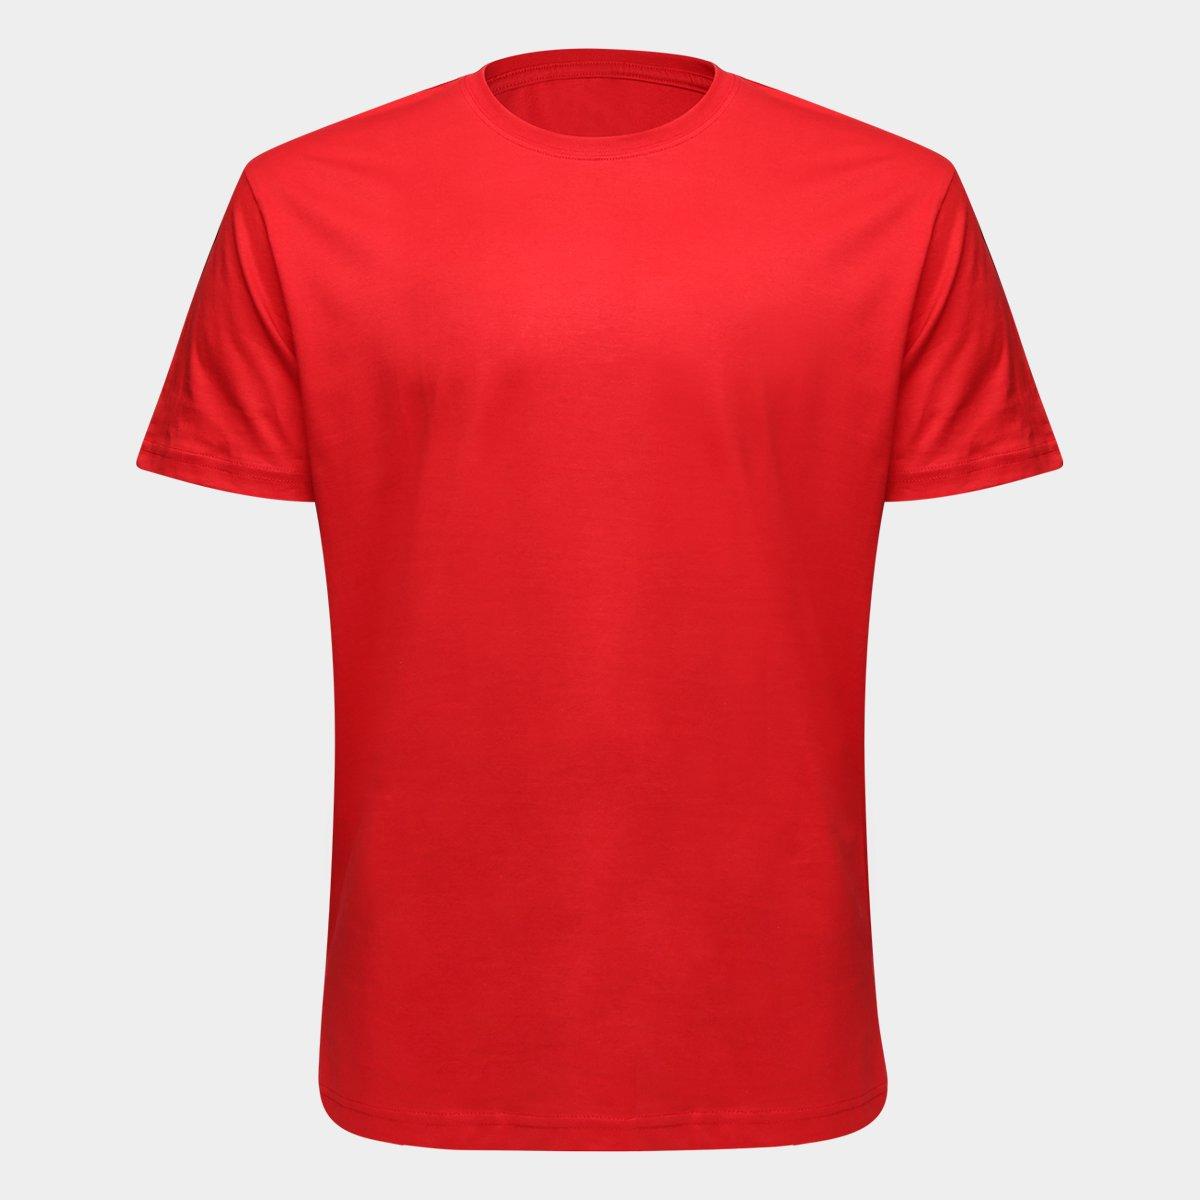 d000aa48c06 Camiseta Basic Blank Internacional - Masculina - Vermelho - Compre Agora